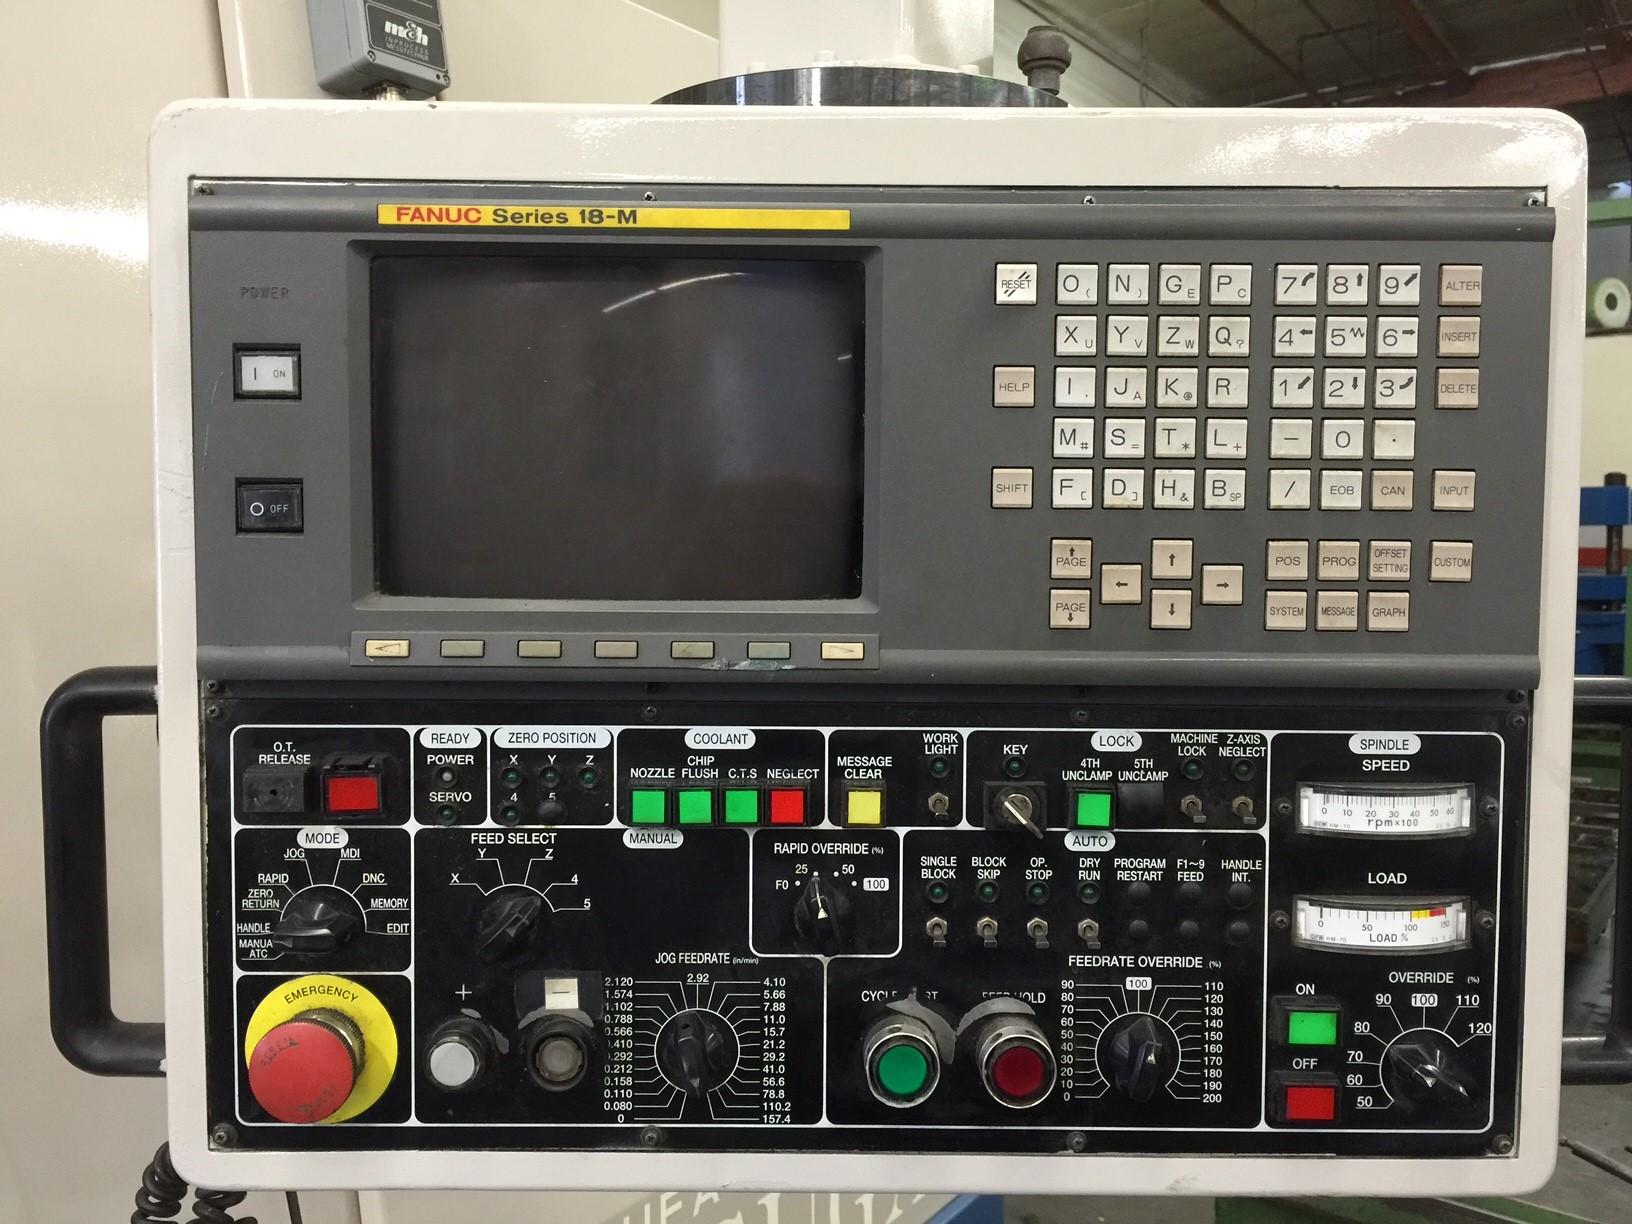 "KASUGAKasuga Quantum Q-1250V, 50""x25""x25.6"", 6K RPM, 25HP, CT50, 40ATC, Fanuc 18M Ctrl, Chip Conveyor, Tsudakoma 4th Axis, Tailstock, Rigid Tapping"